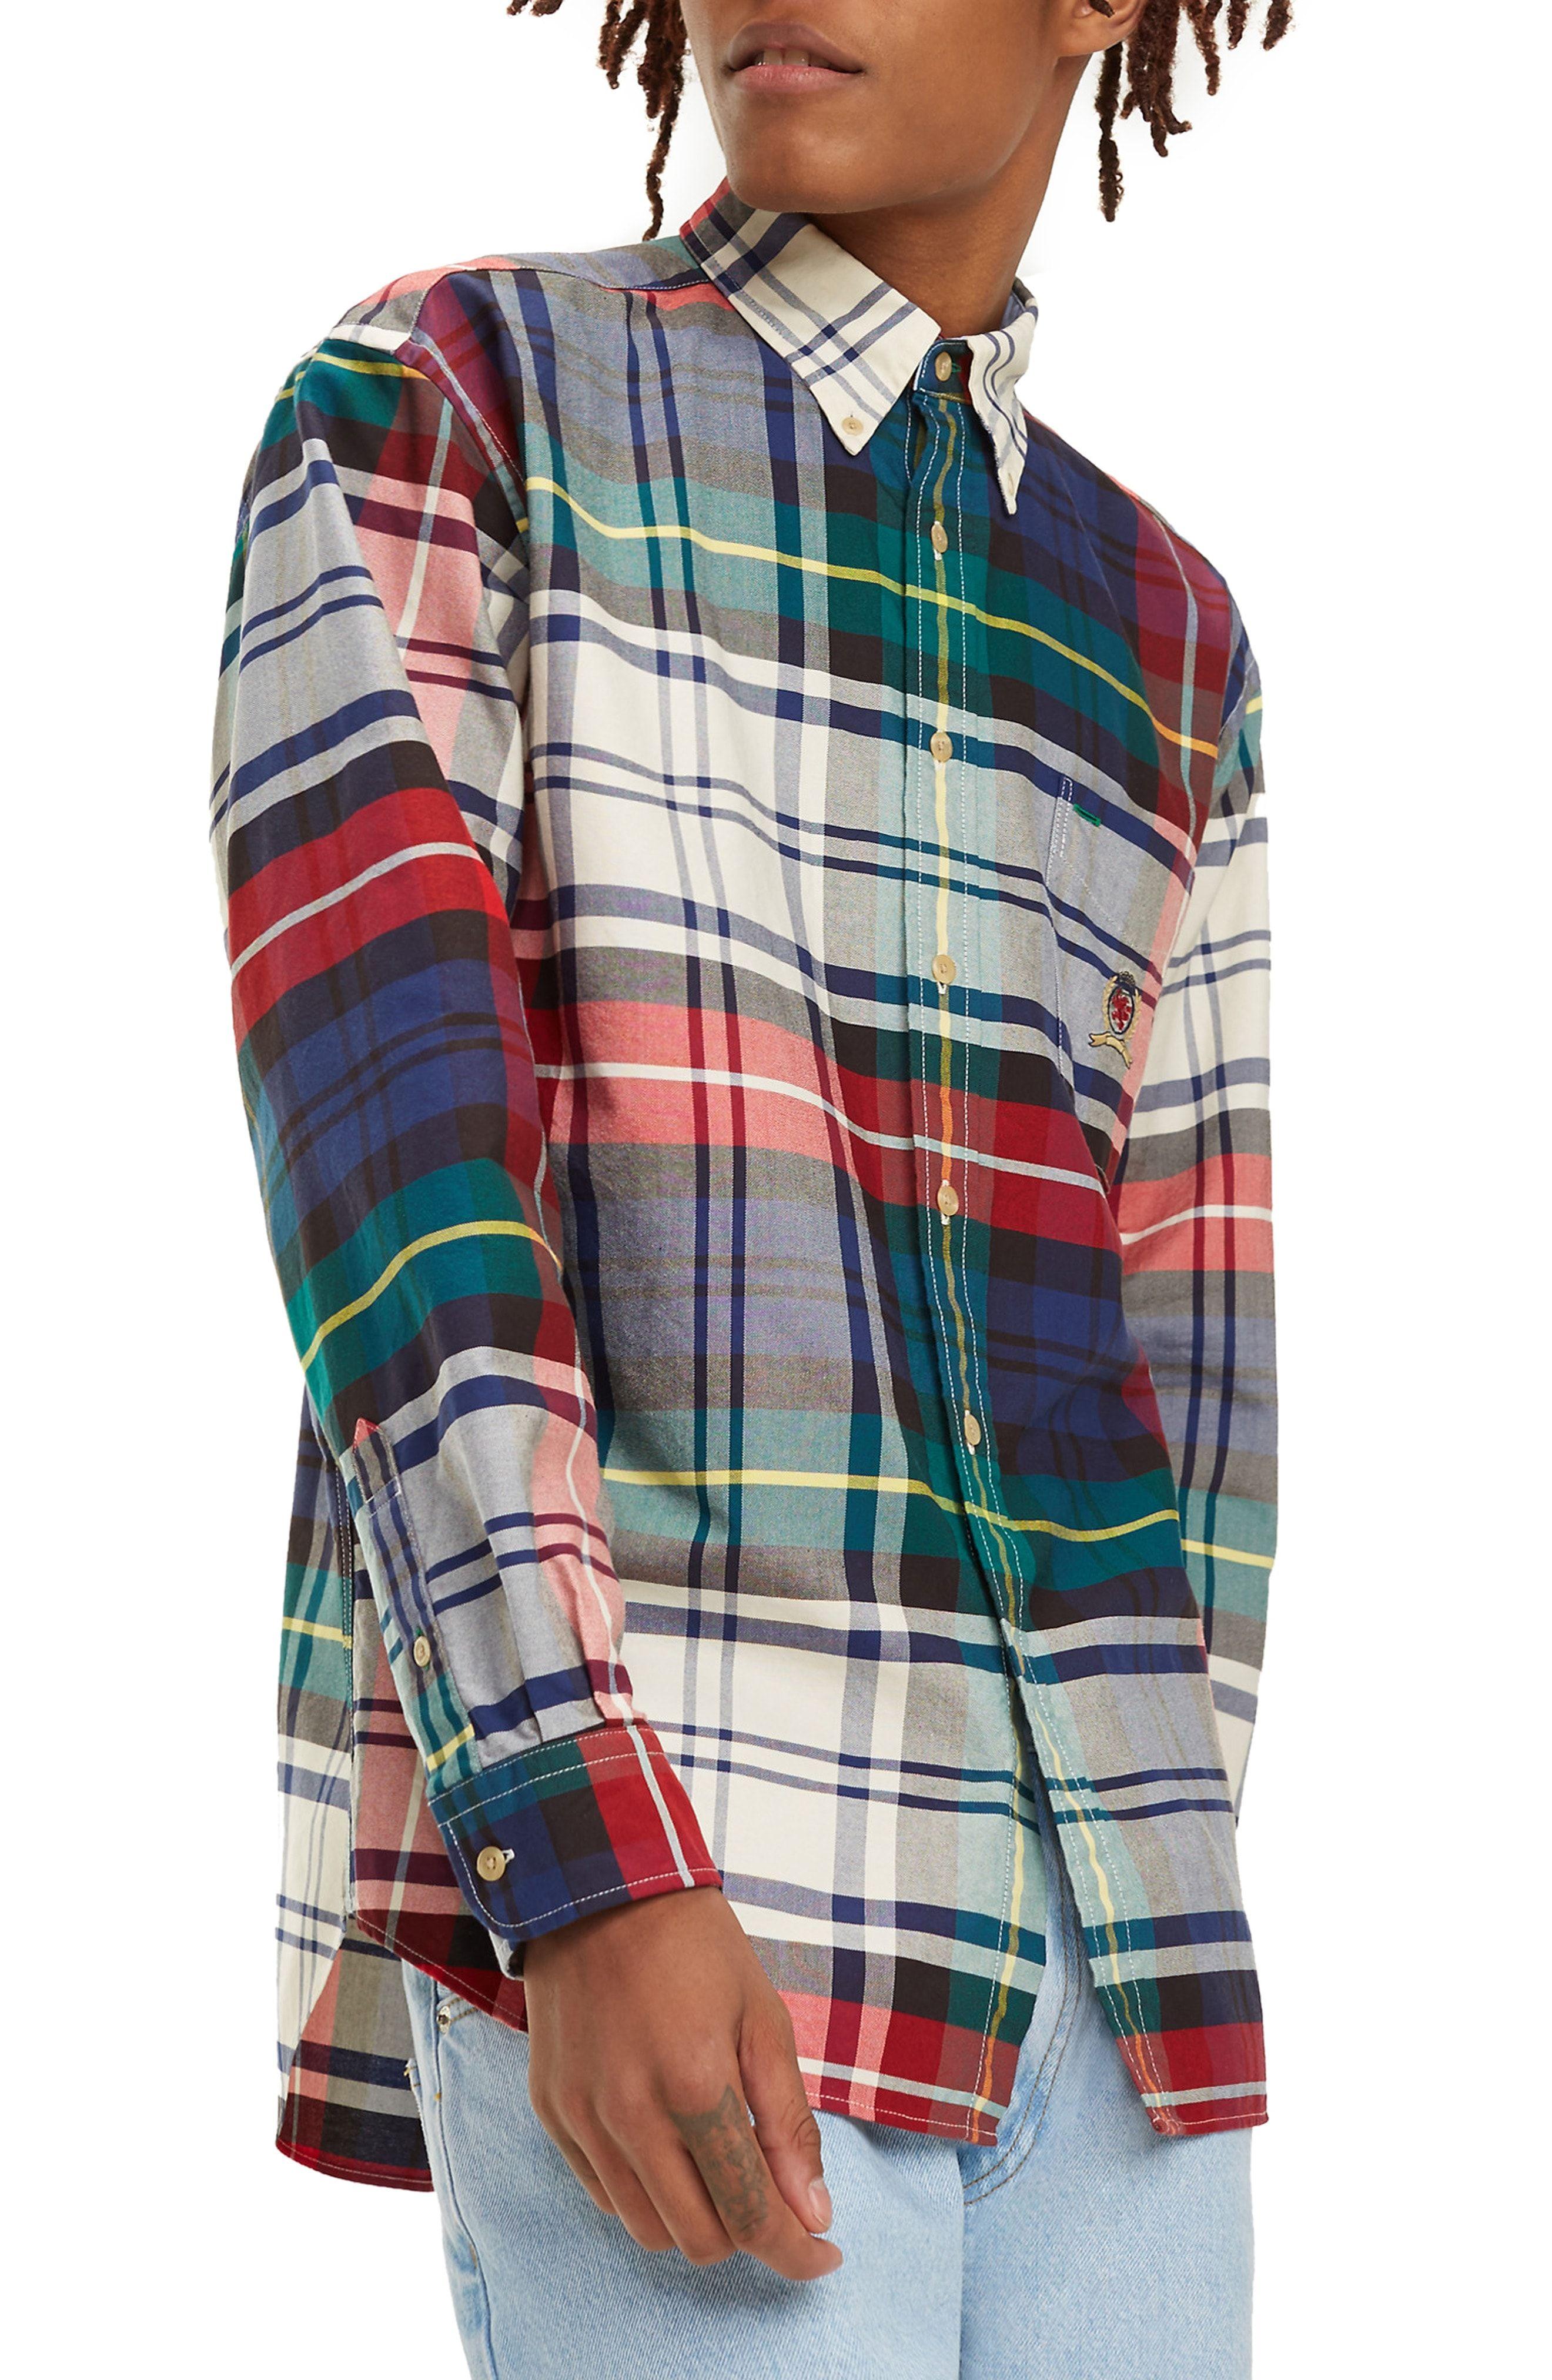 6bf70de6 TOMMY JEANS TJM PLAID CREST SPORT SHIRT. #tommyjeans #cloth | Tommy ...